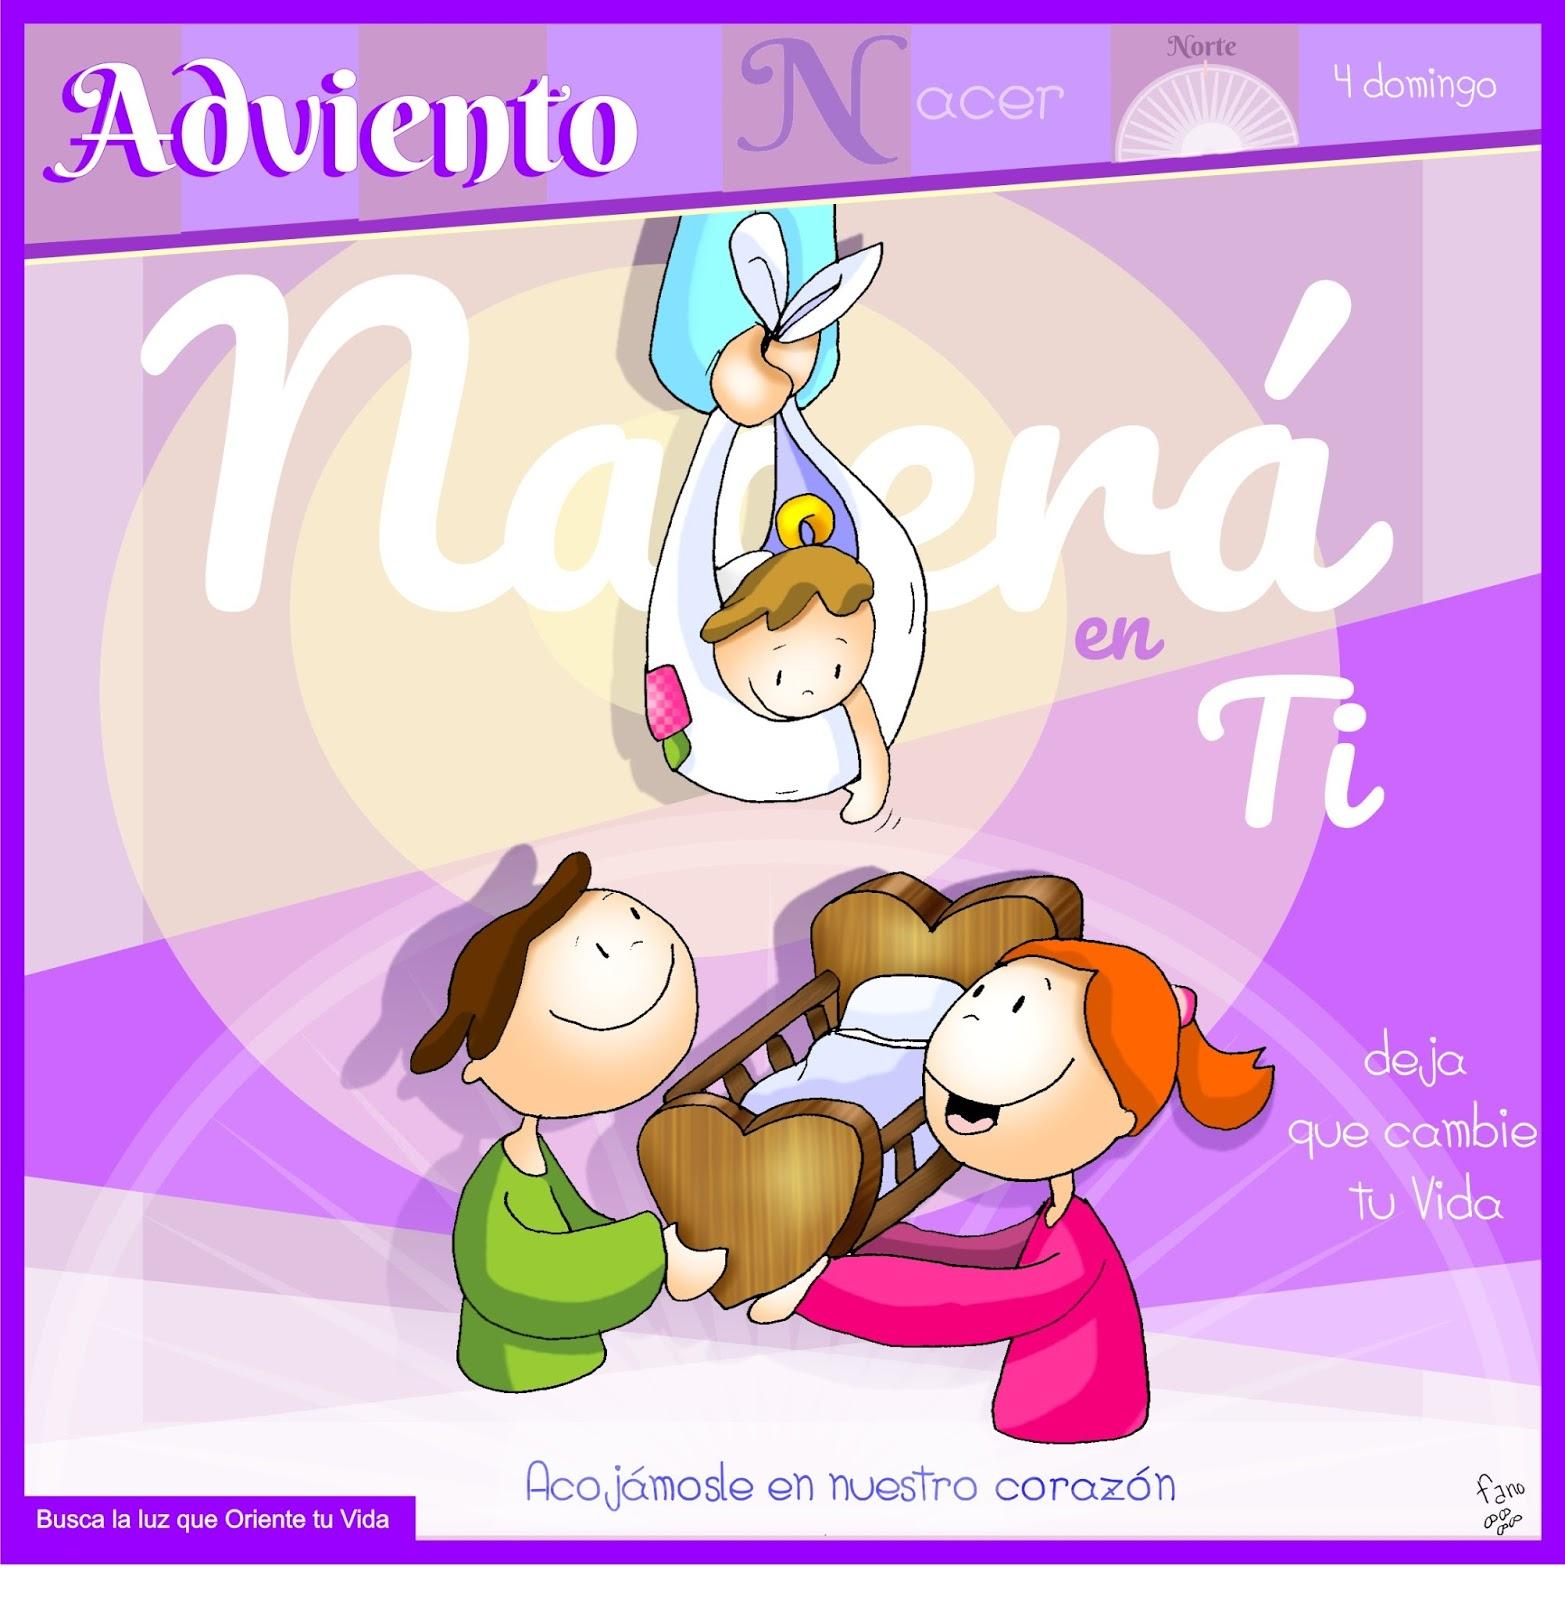 La Catequesis (El blog de Sandra): Dibujo de Fano Cuarto Domingo de Adviento  Ciclo B